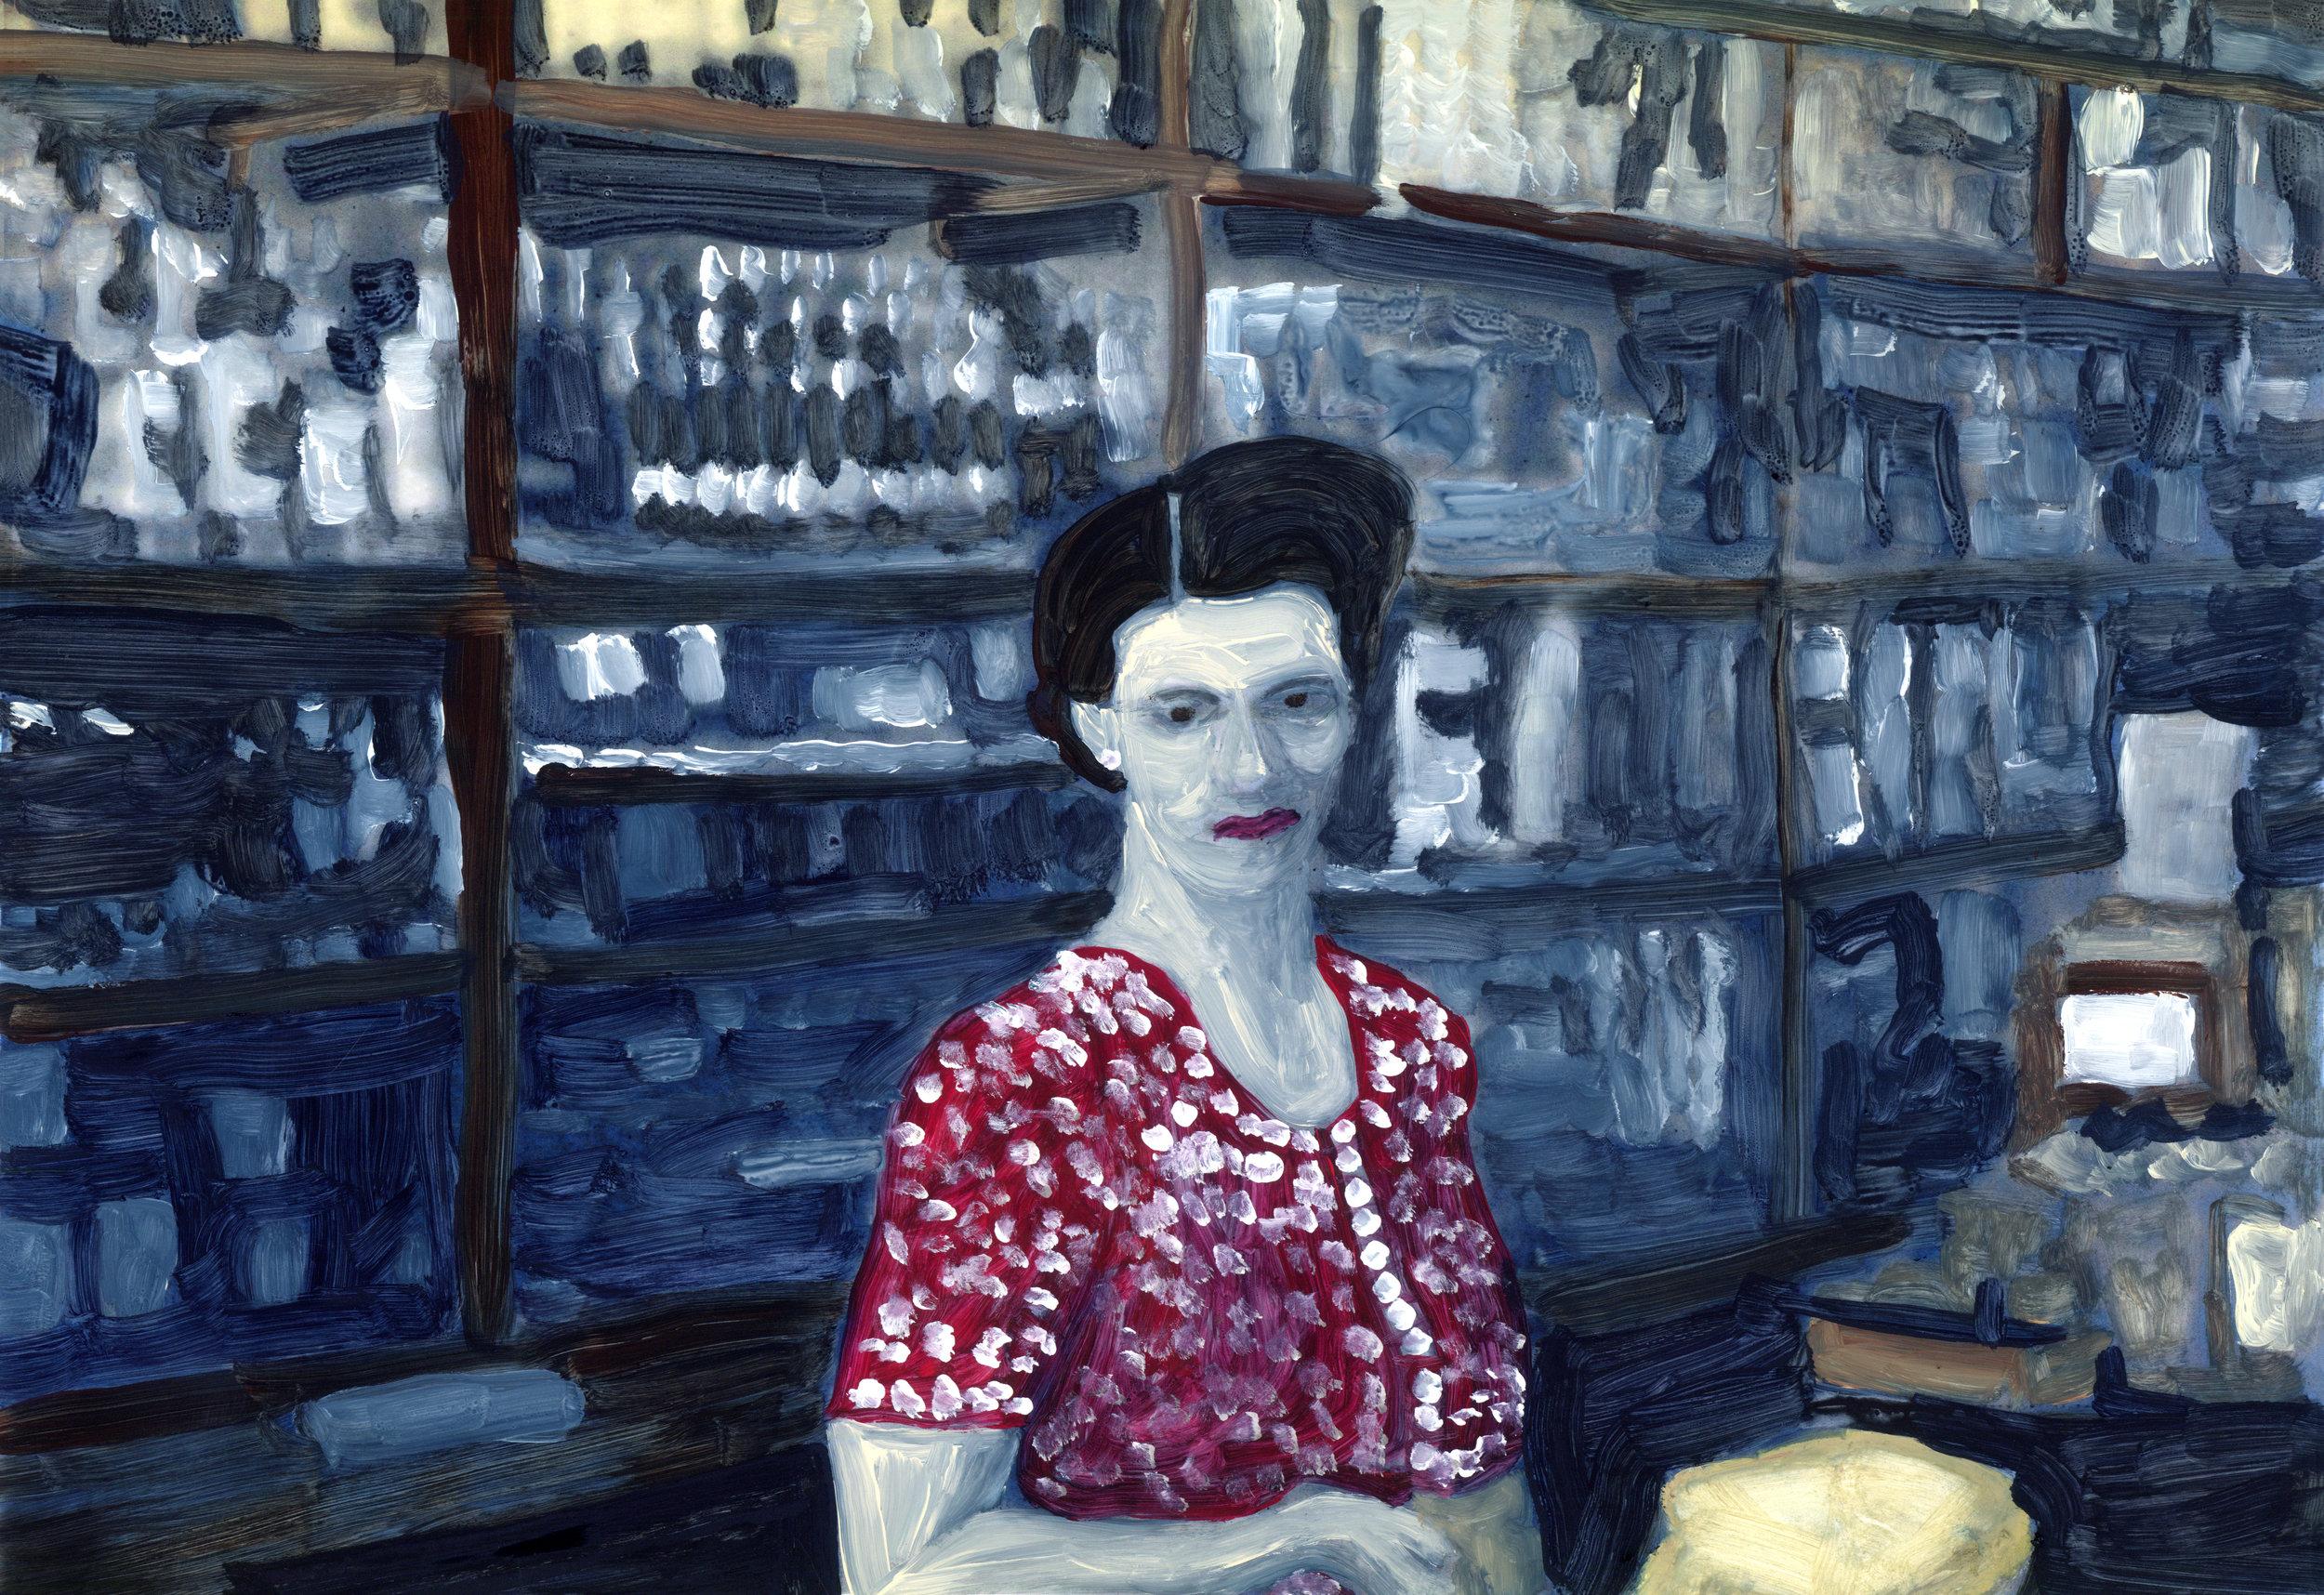 the shopgirl